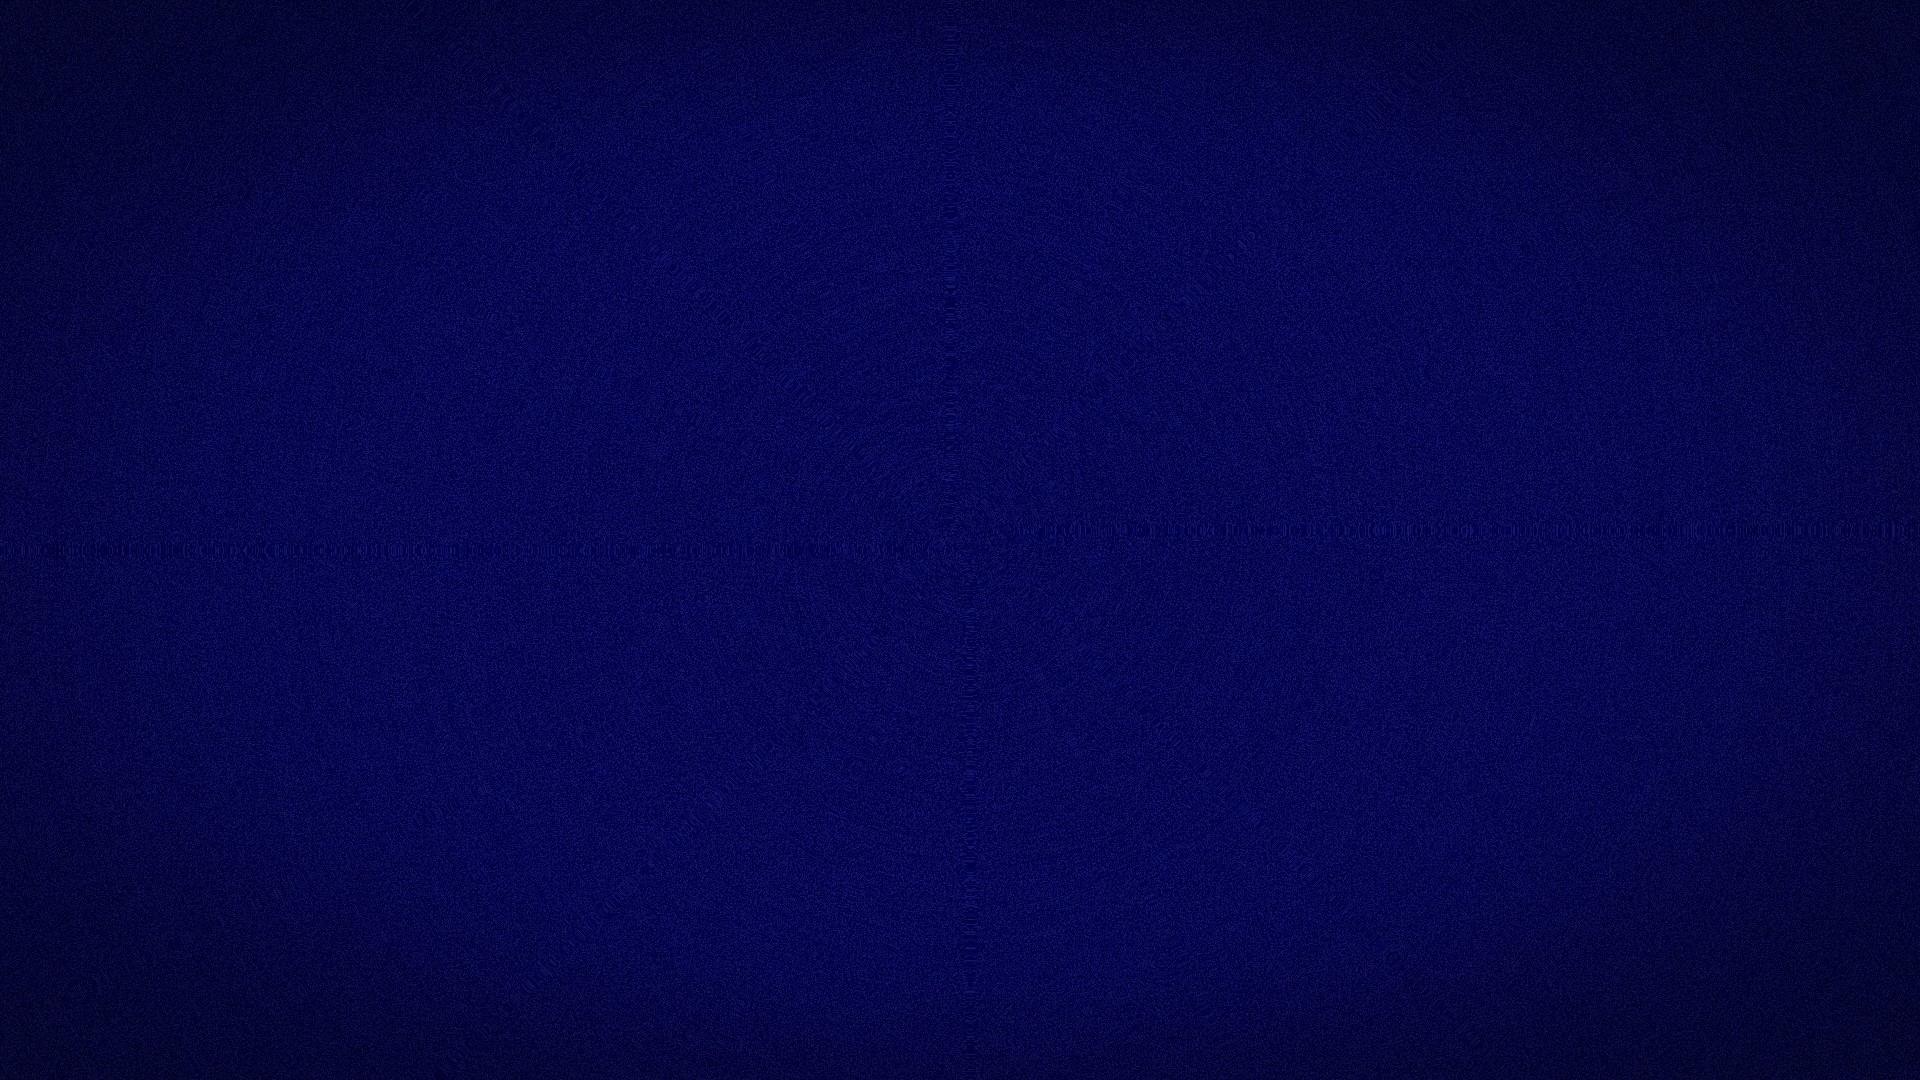 Blue Solid Color Wallpaper #754606 Solid Black Wallpaper #891256 Solid .